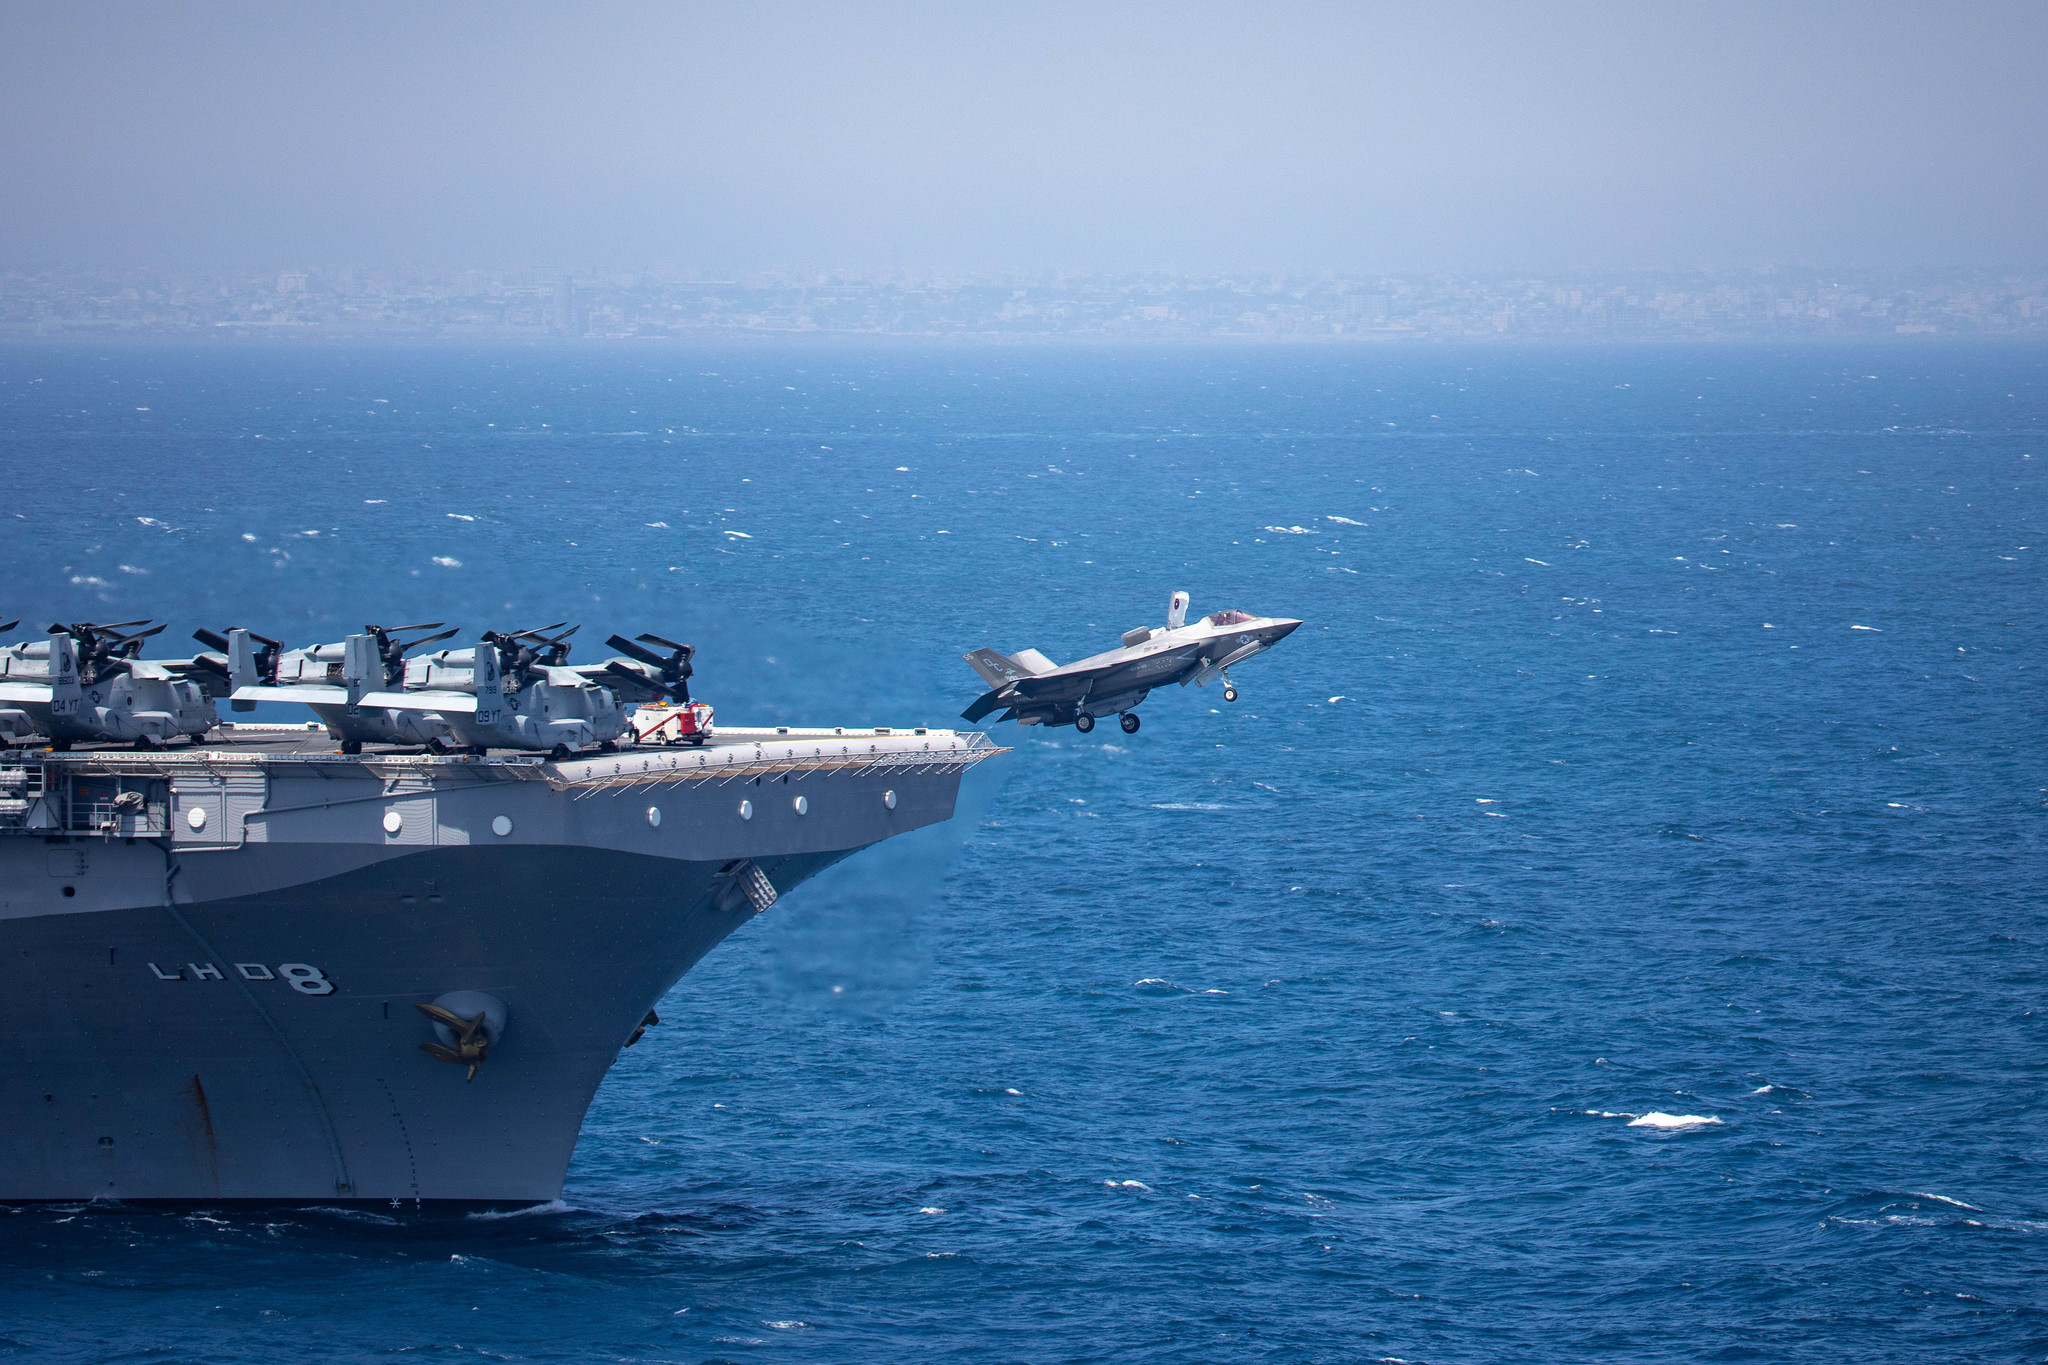 A U.S. Marine Corps F-35B Lightning II takes off from the amphibious assault ship USS Makin Island (LHD 8) on Dec. 22, 2020, in the Indian Ocean. (MC2 Jacob D. Bergh/Navy)